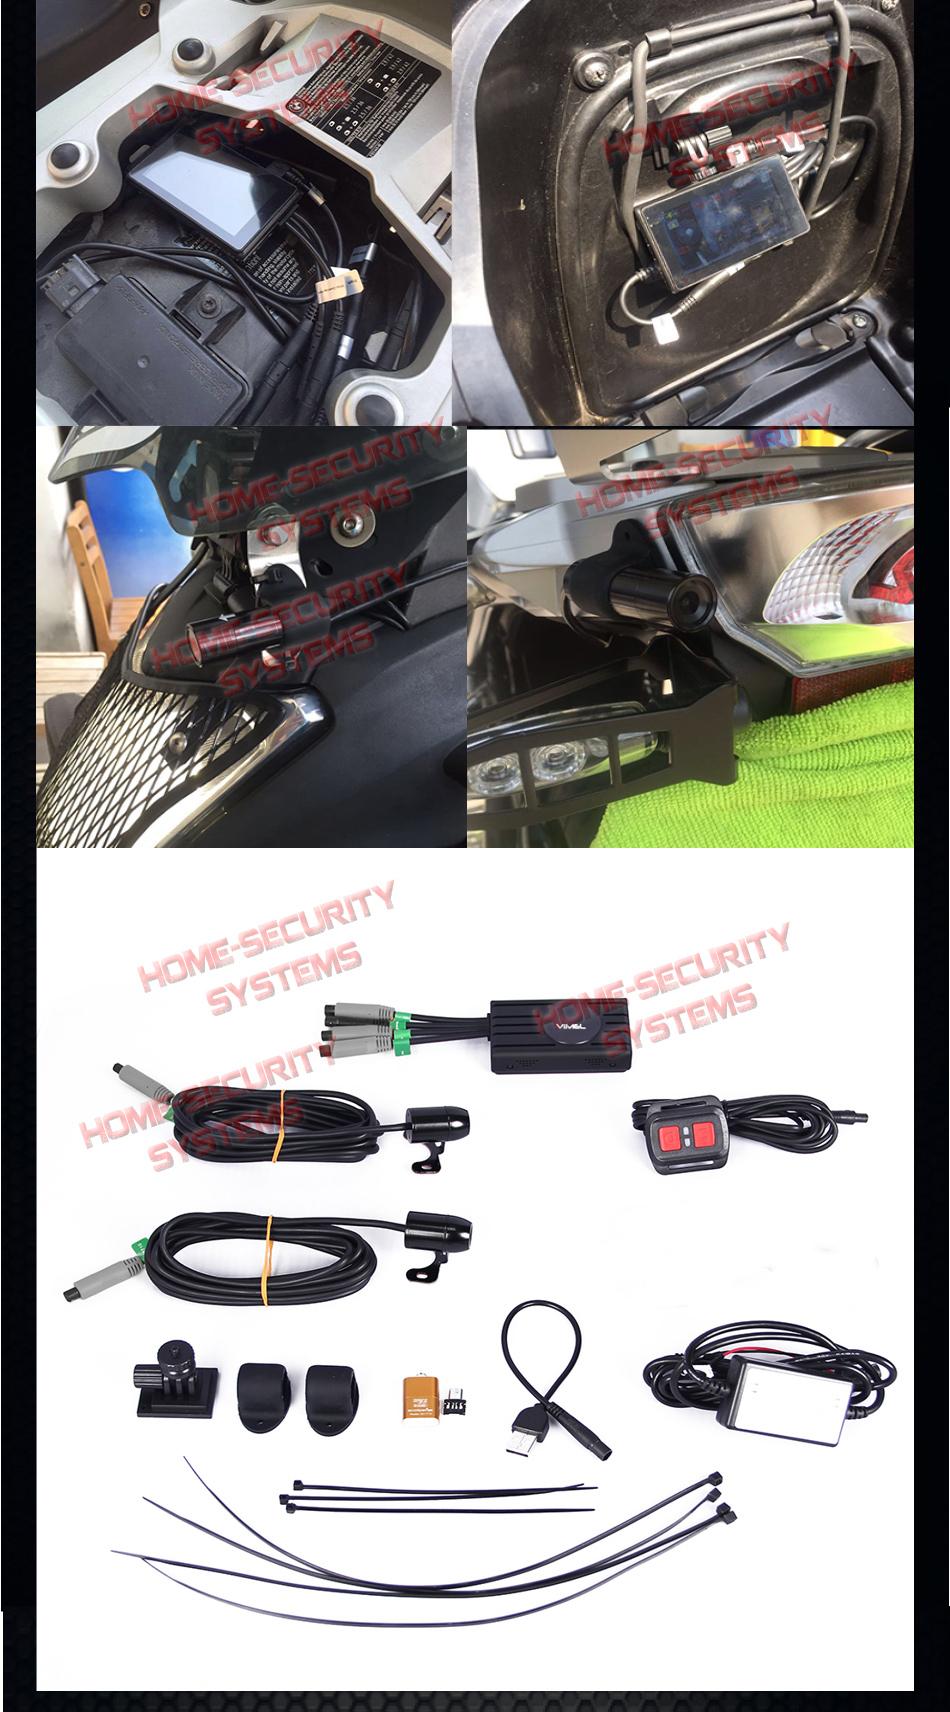 8a1201108ab5 Bike Camera Motorcycle 1080 Twin Motorbike Car Waterproof Hardwired ...